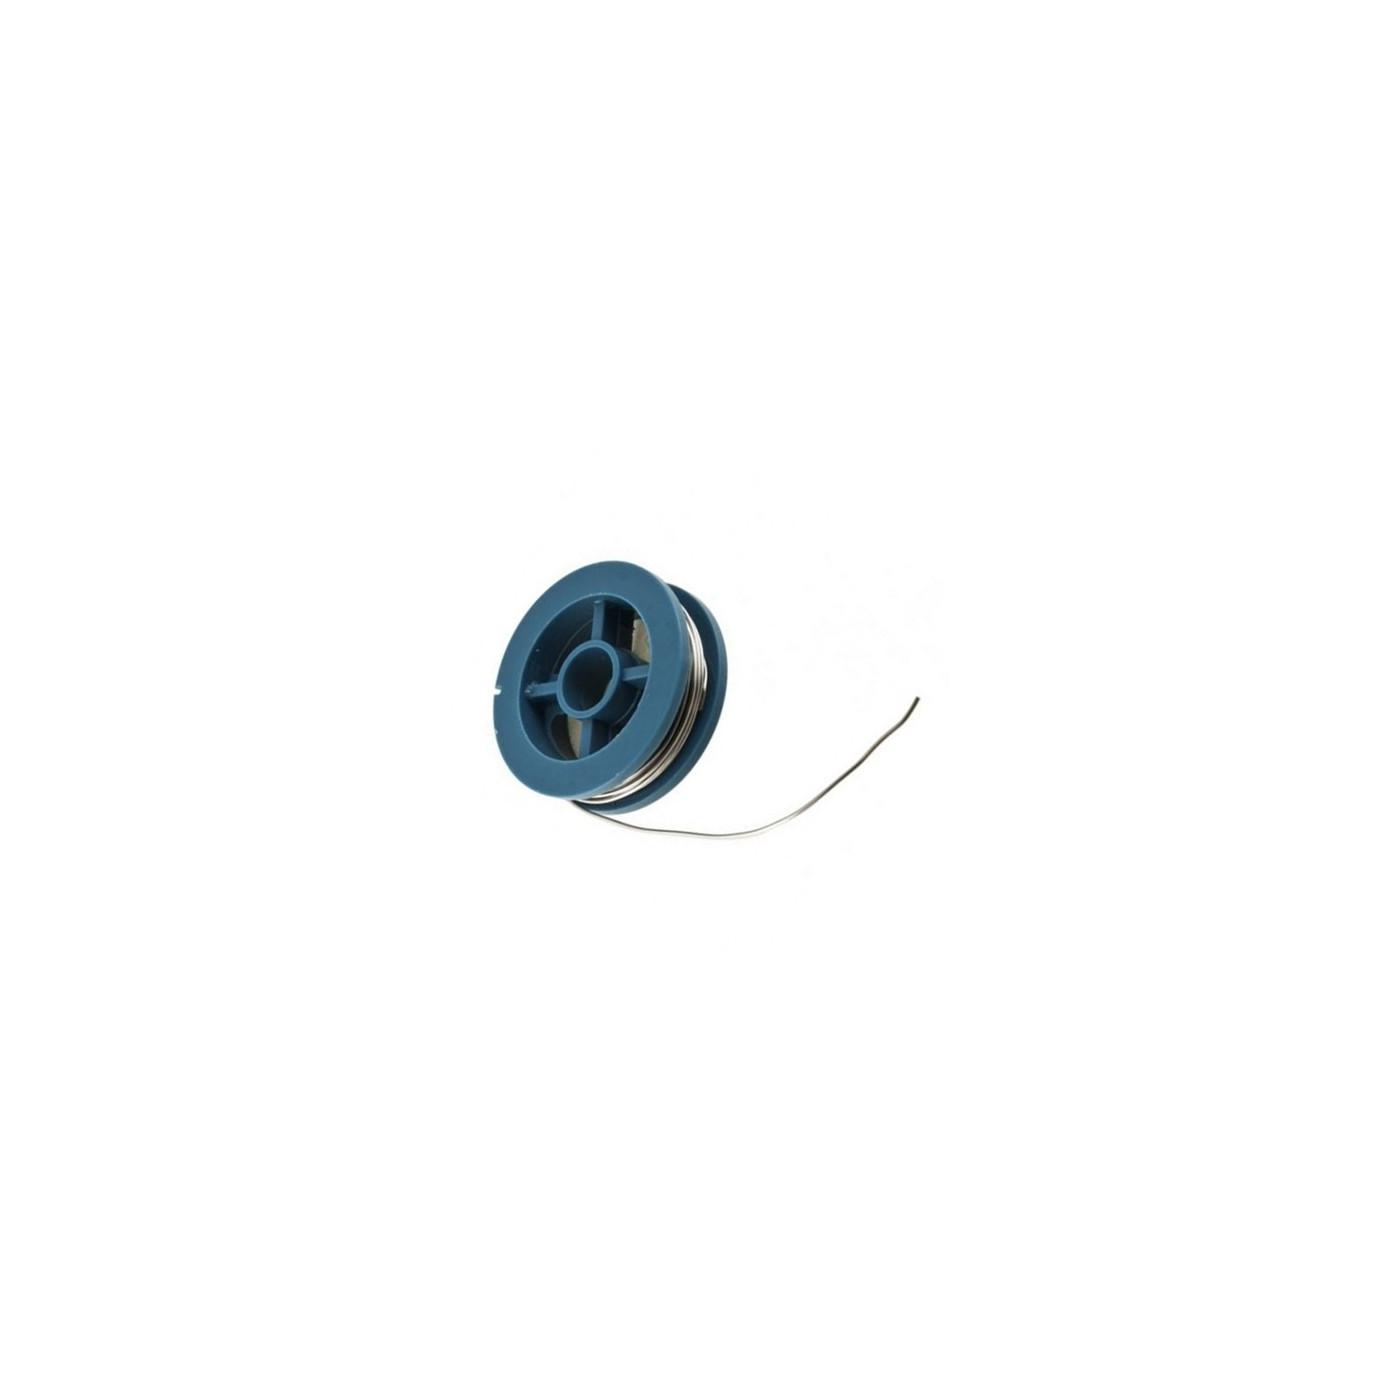 Lötzinn 0,8 mm, Kleinpackung  - 1